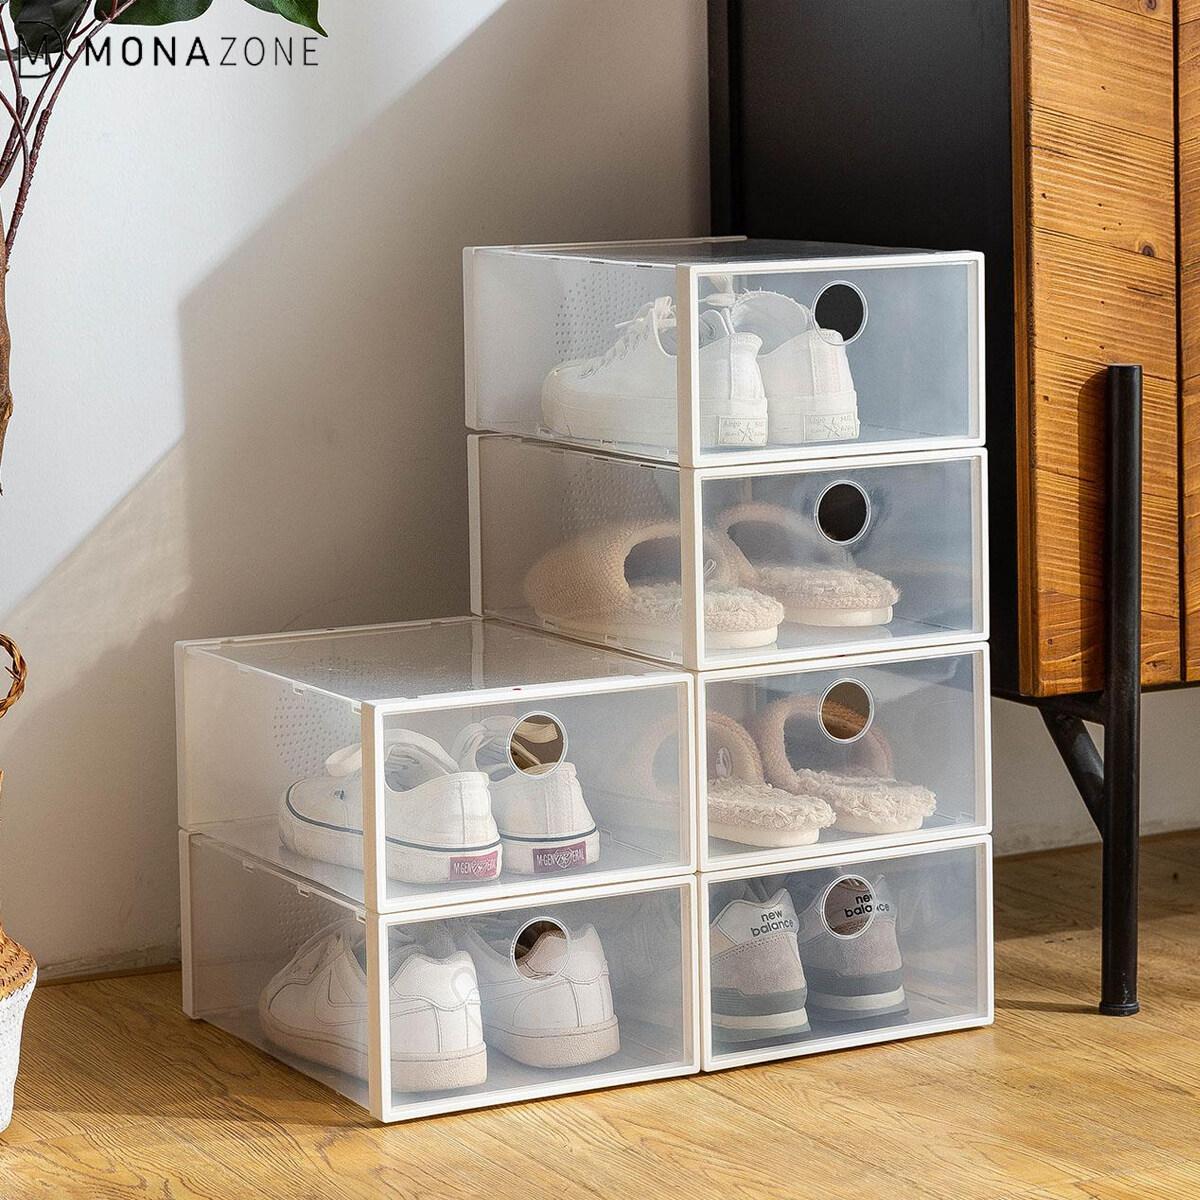 MONAZONE Transparent Stackable Shoe Box Storage Box Clear Plastic Thicken Drawer Dustproof Moisture-proof Household Shoes Drawer Storage Box( 2 pcs)